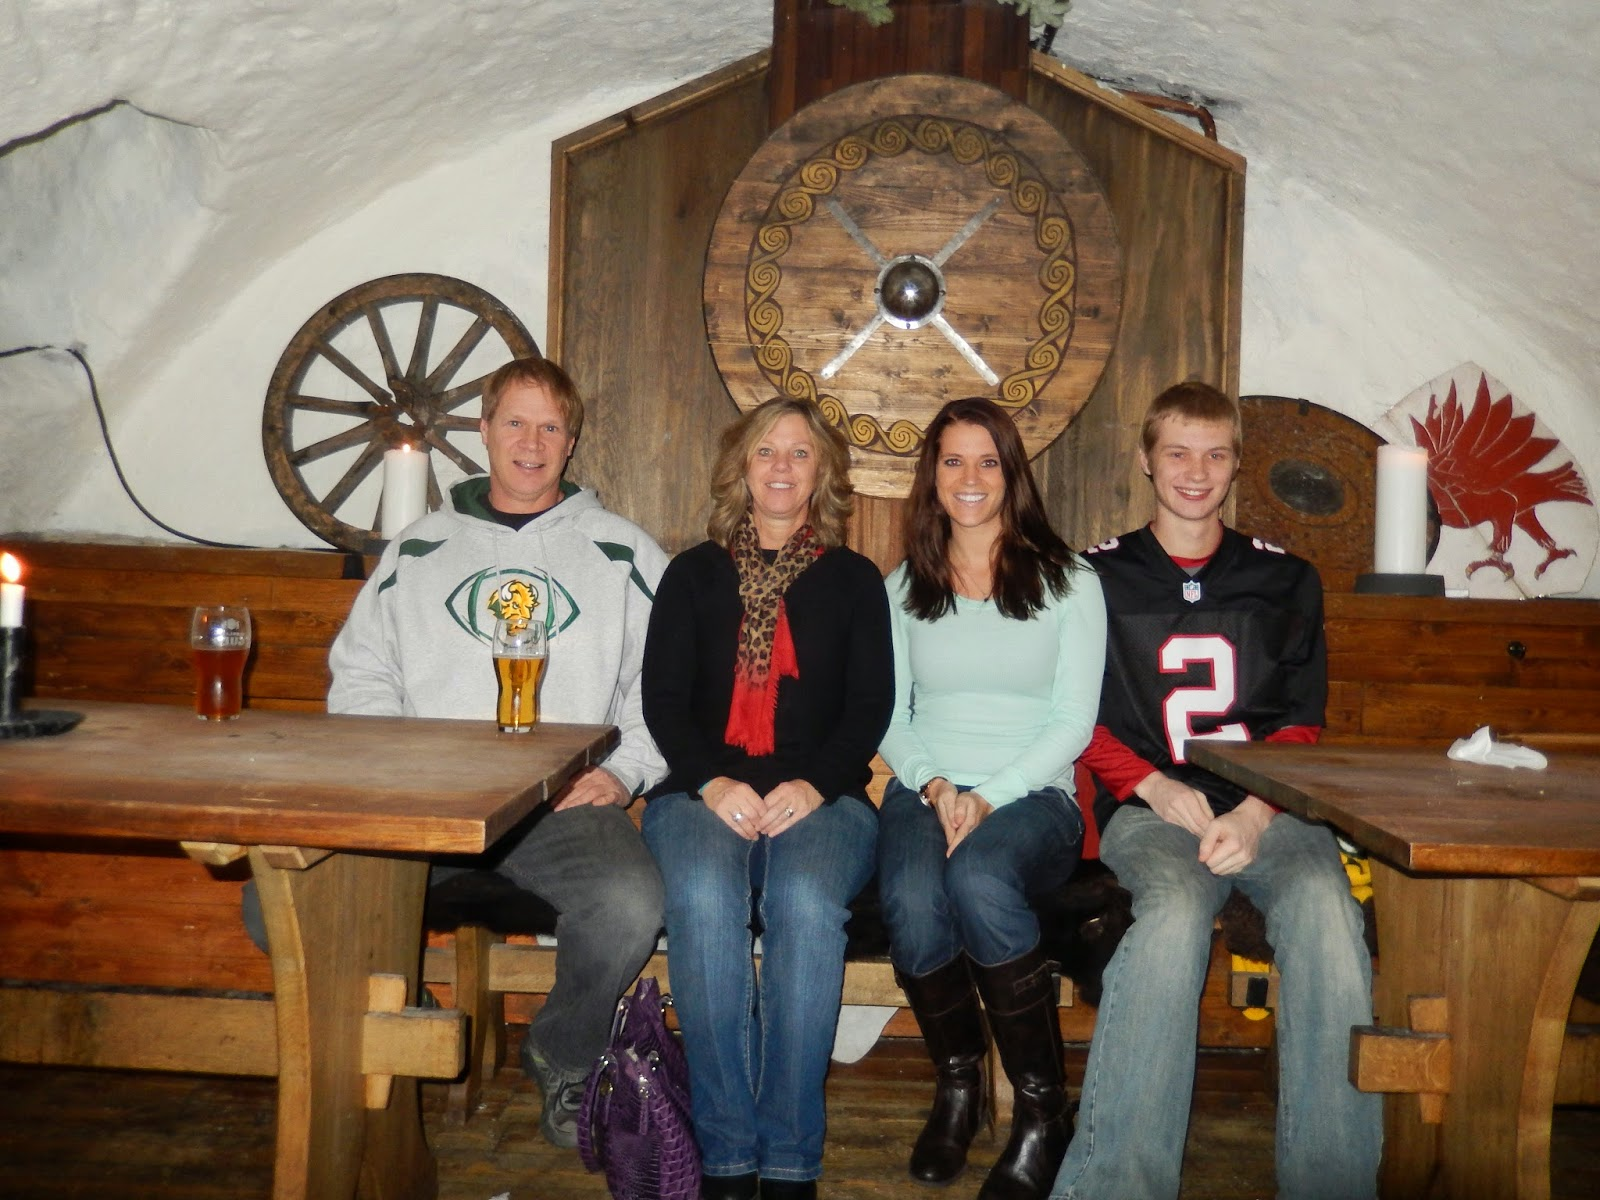 Stockholm basement pubs